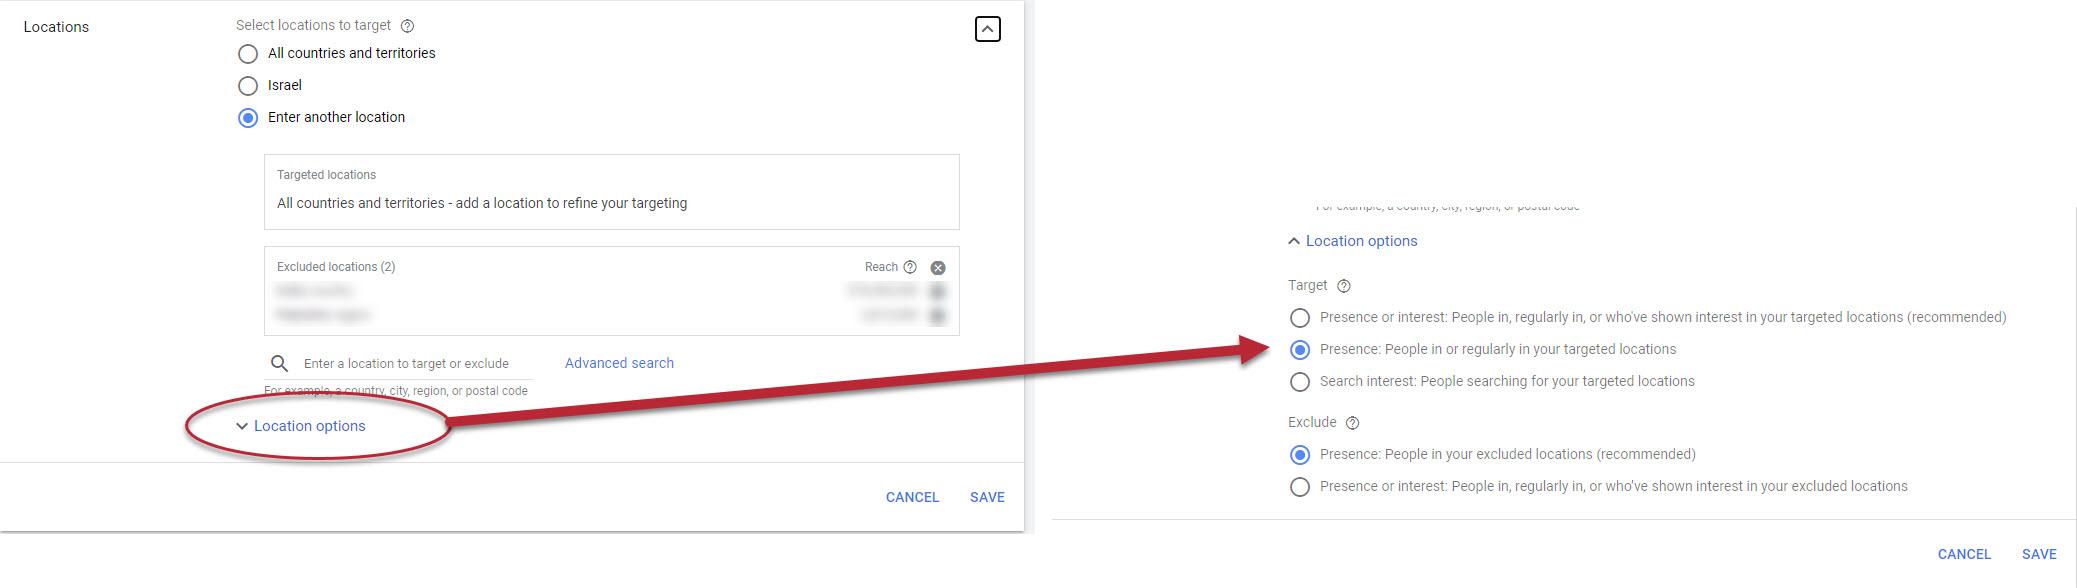 Google Ads Location Settings